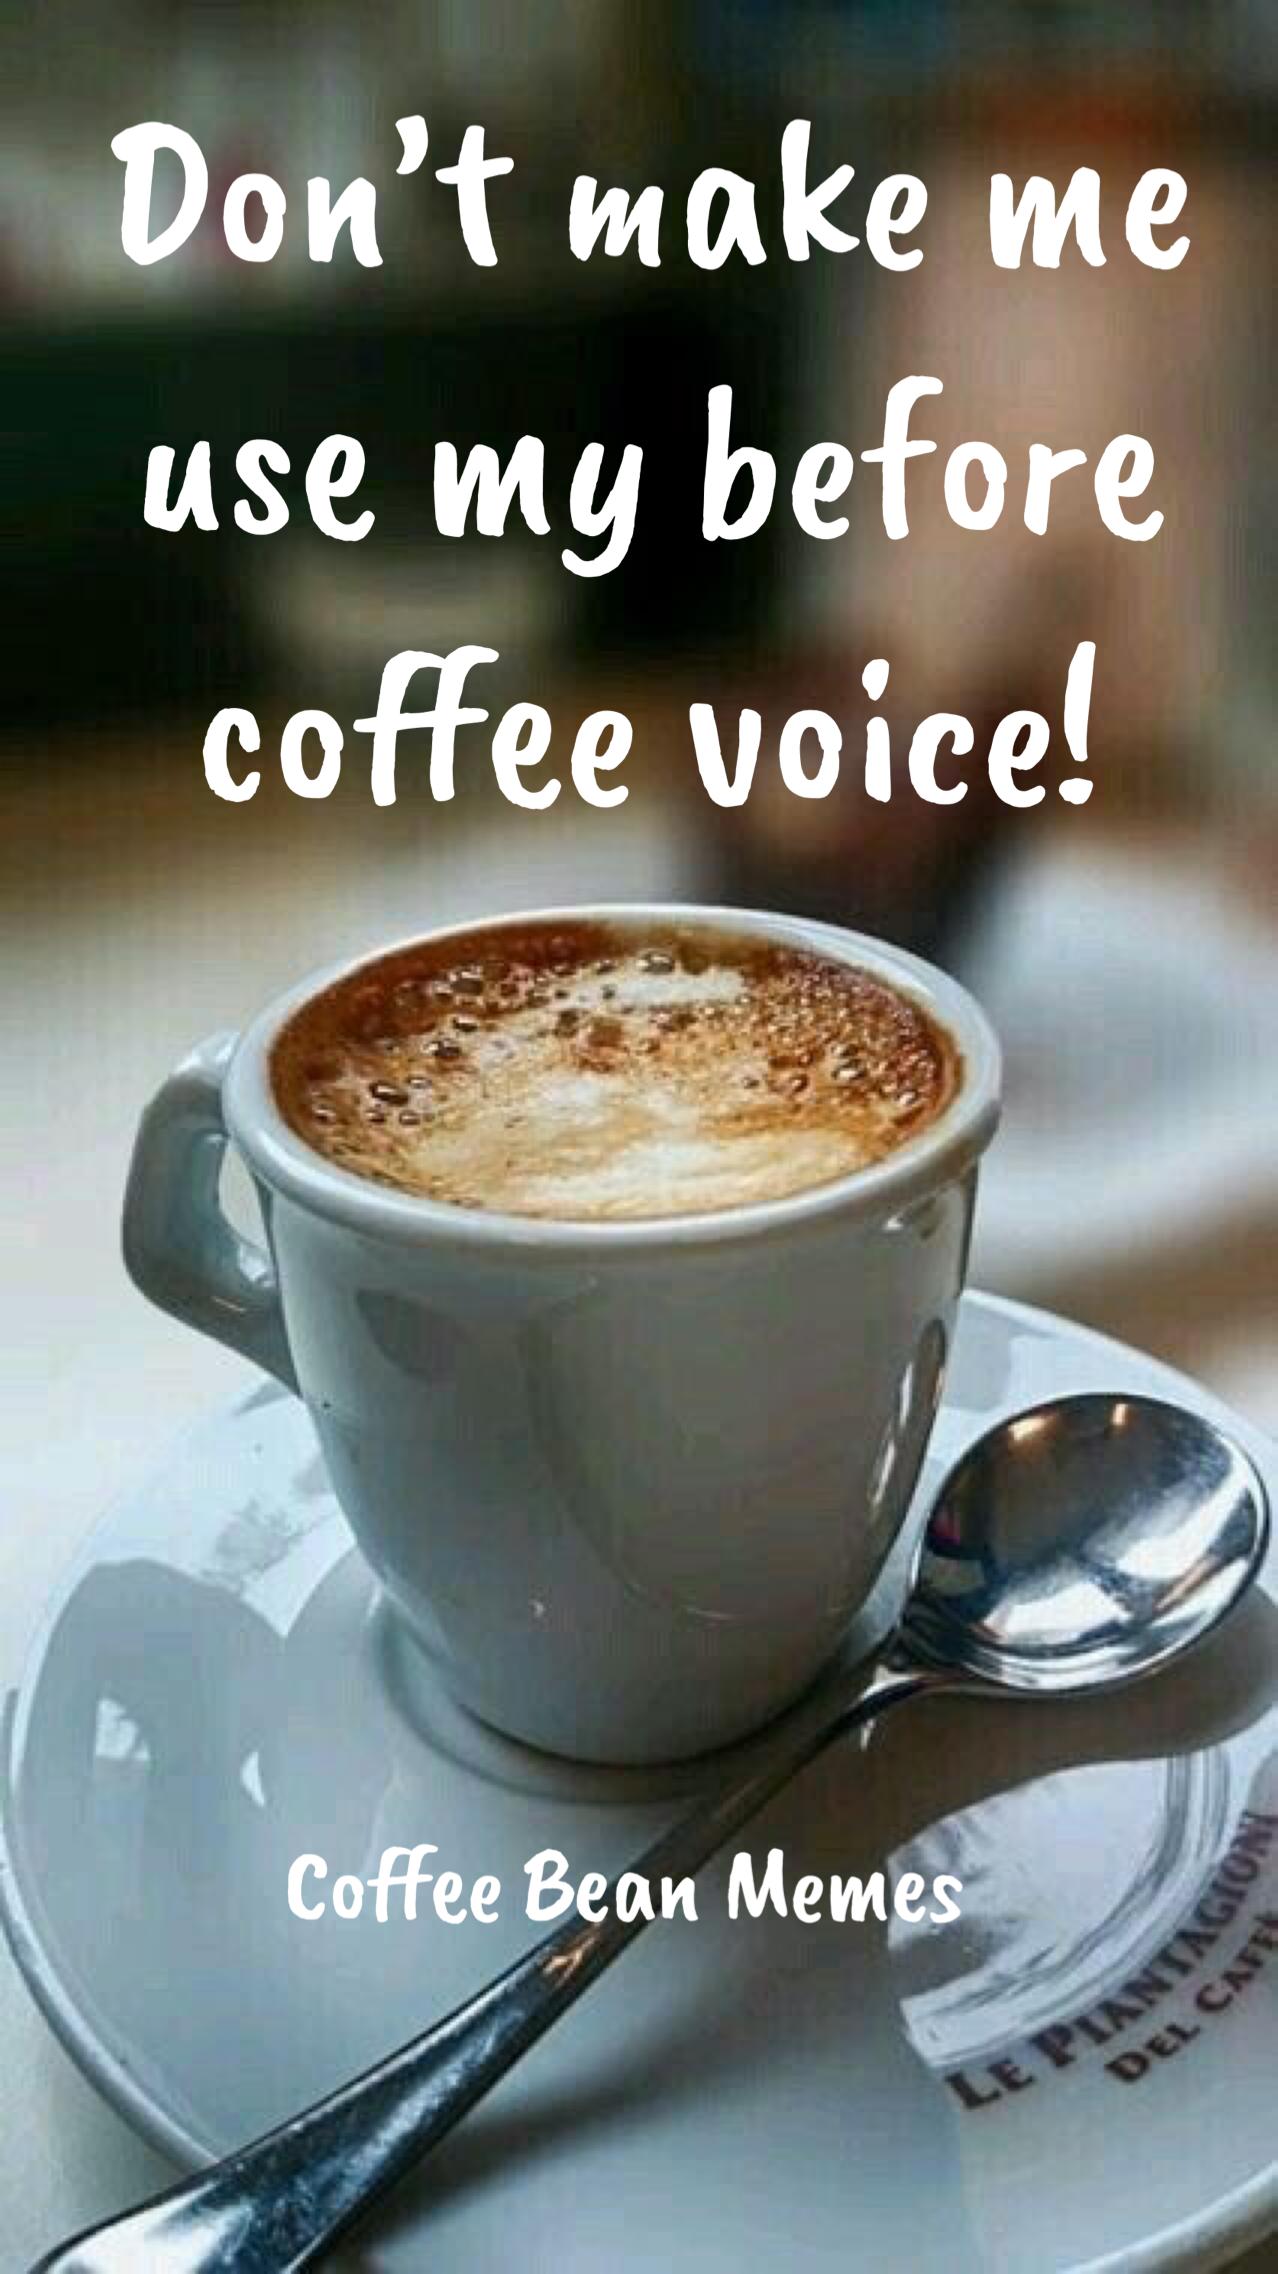 Pin by Reita Jaseph on Coffee Bean Memes #coffeebeanmemes #coffee ... #coffeeBean